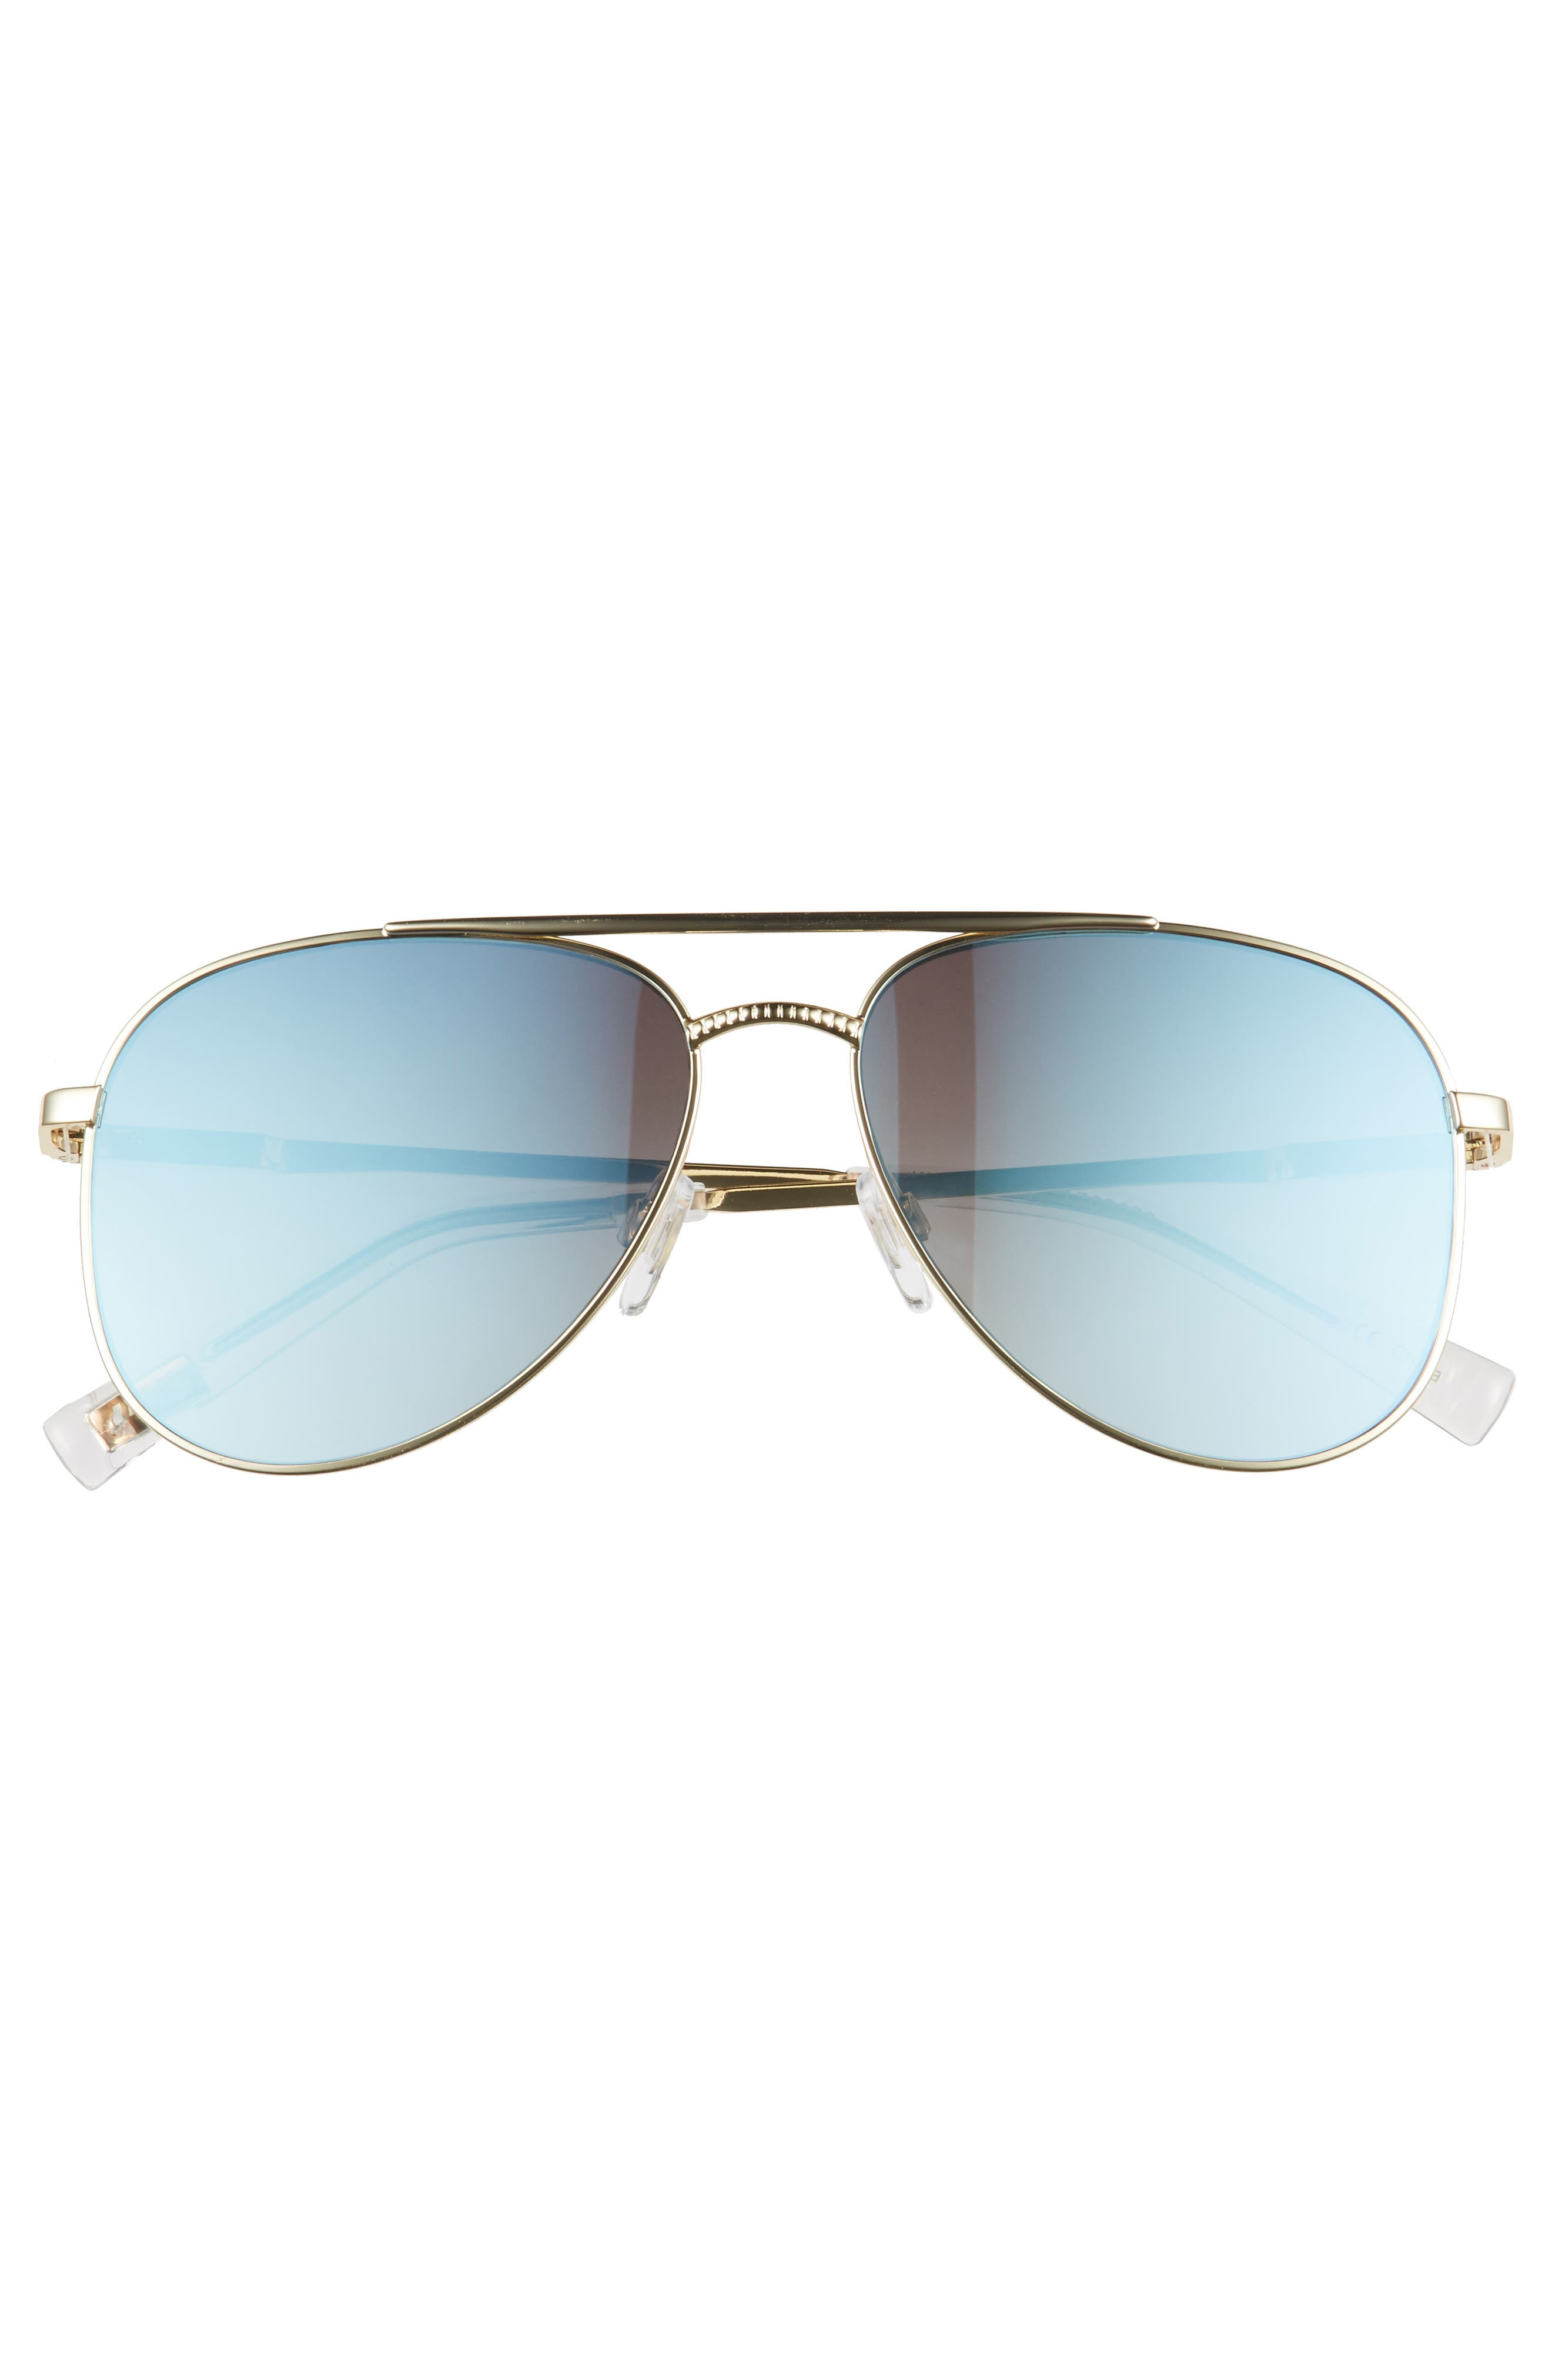 Kingdom 57mm Polarized Aviator Sunglasses,                             Alternate thumbnail 3, color,                             Bright Gold